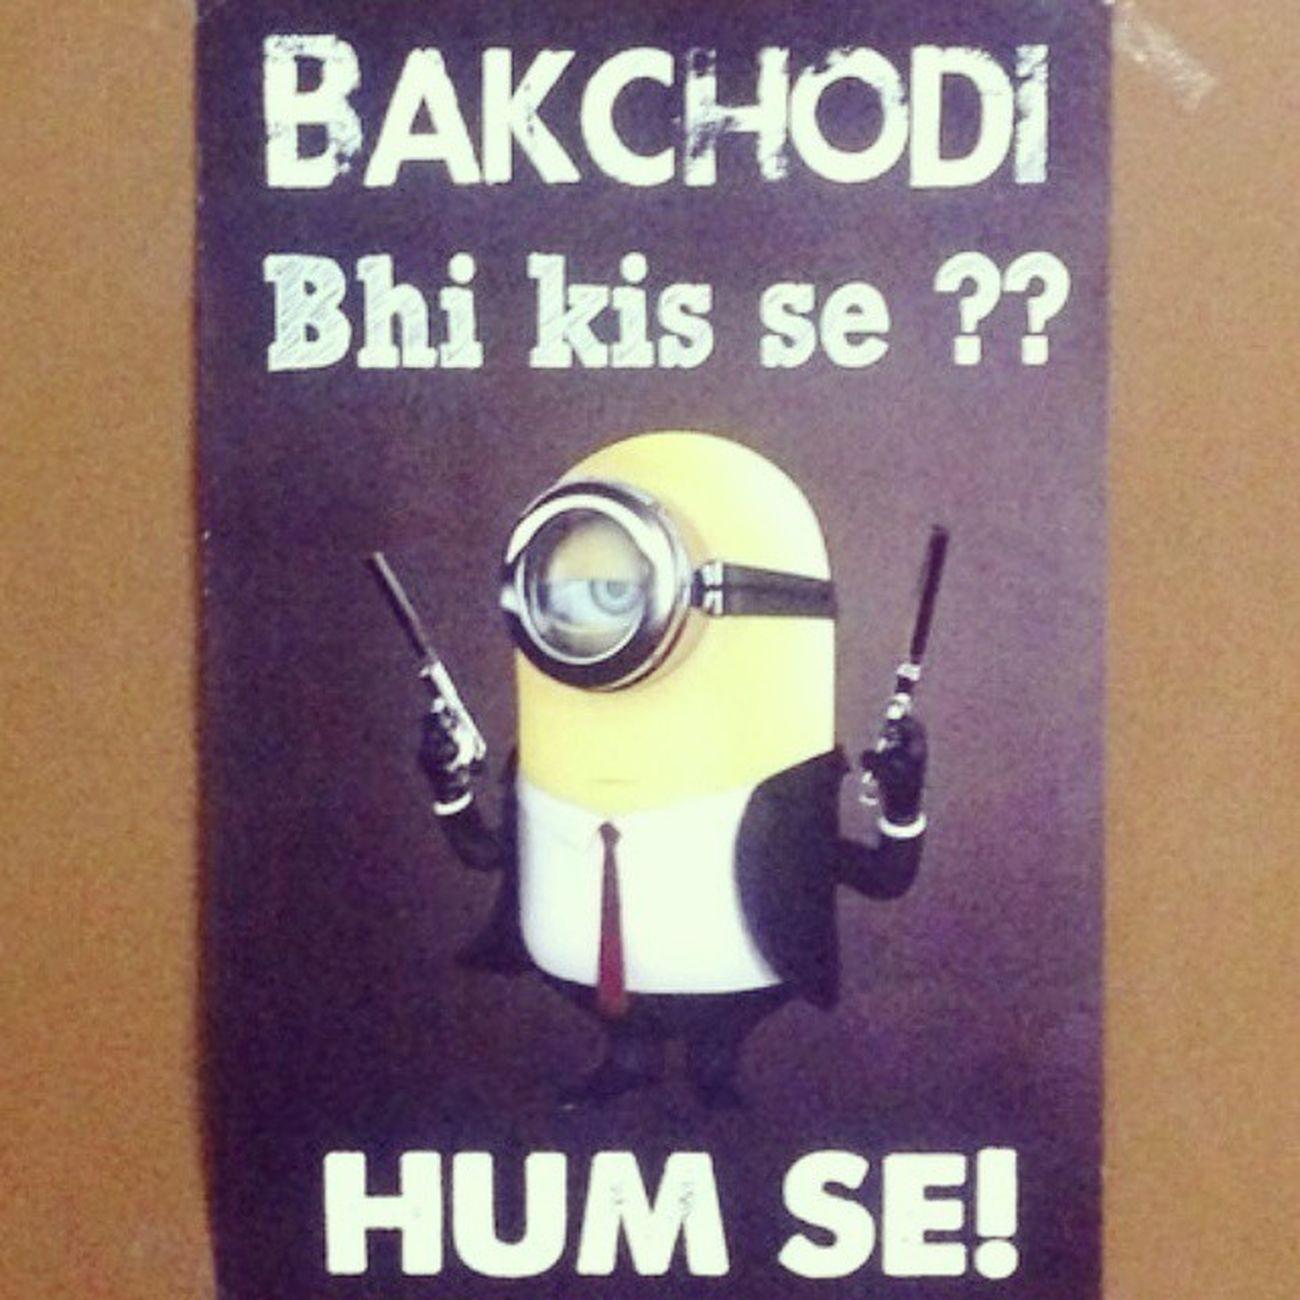 Minion's lakhnawi caption! MinionLove Bakchodi Humhaibe Lucknow